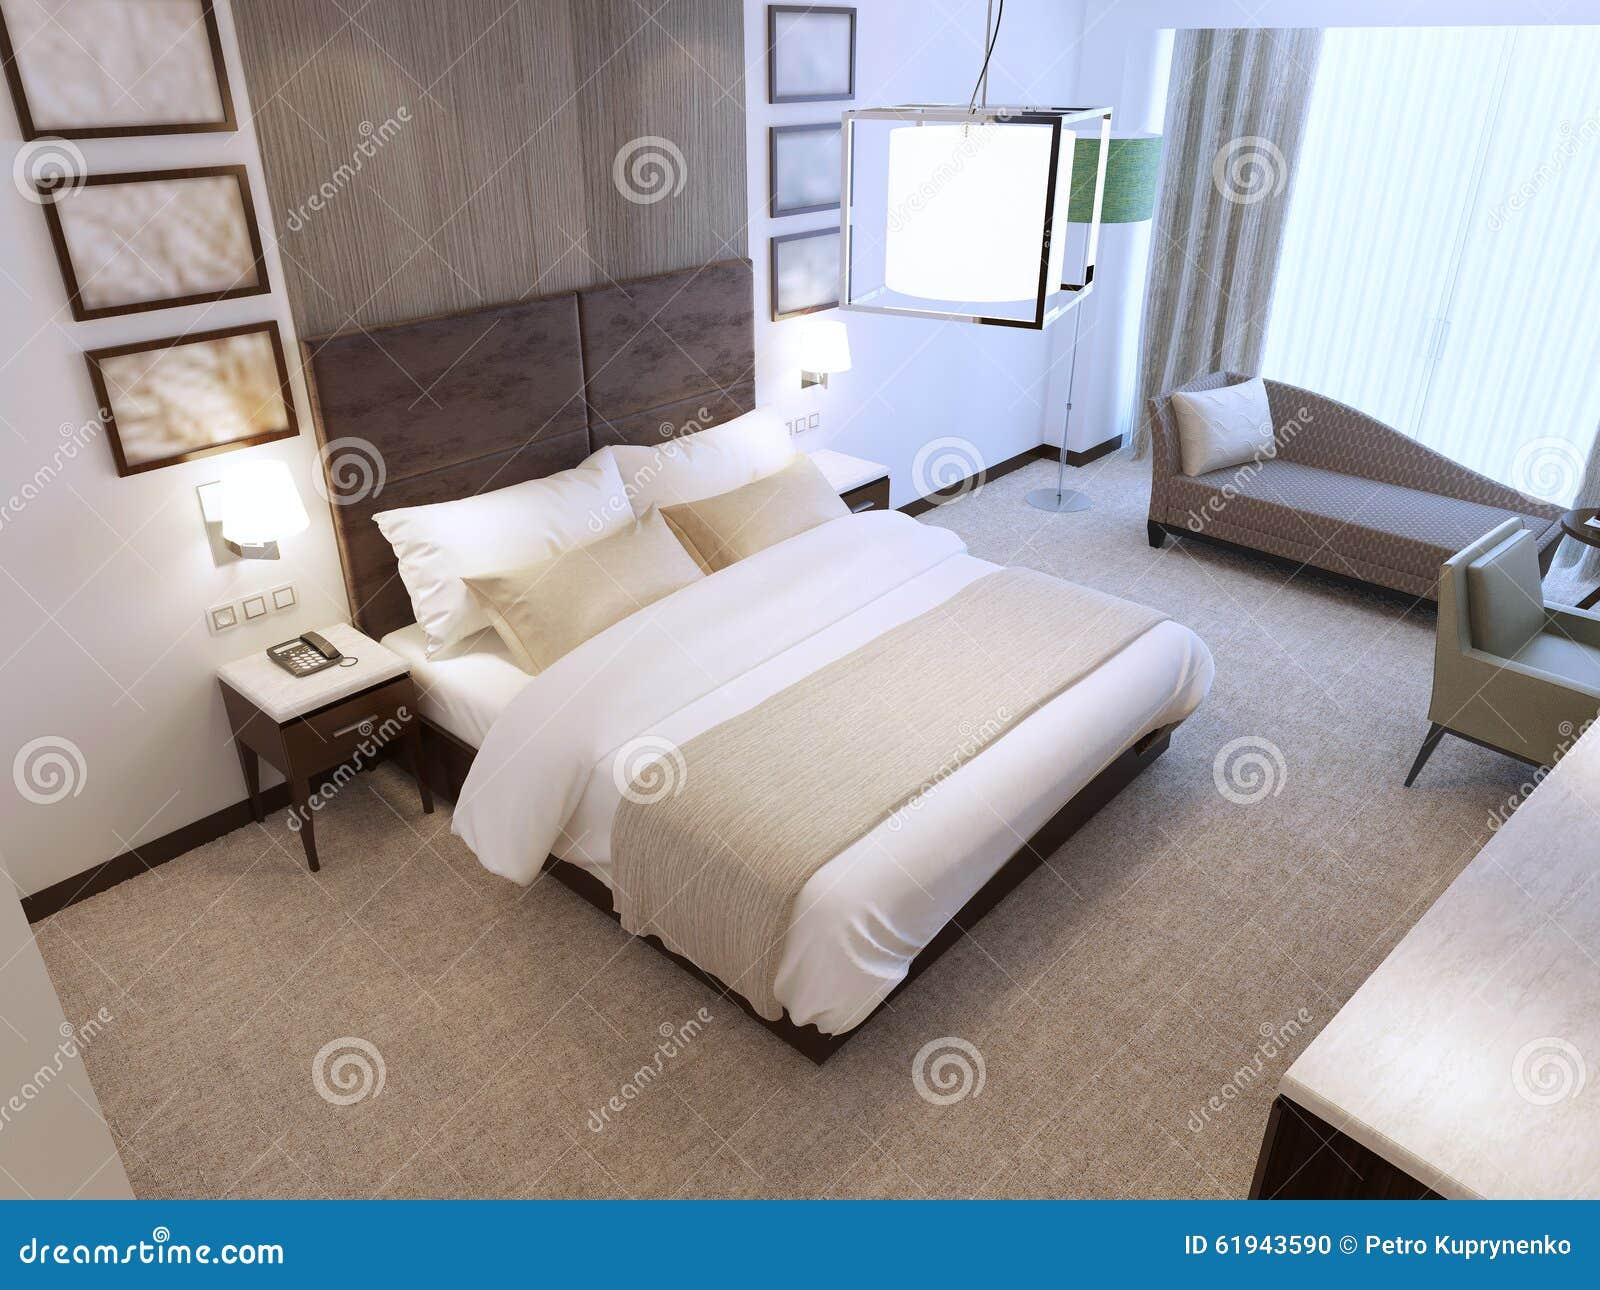 Houten Muurdecoratie Slaapkamer : Moderne slaapkamer in daglicht stock illustratie illustratie